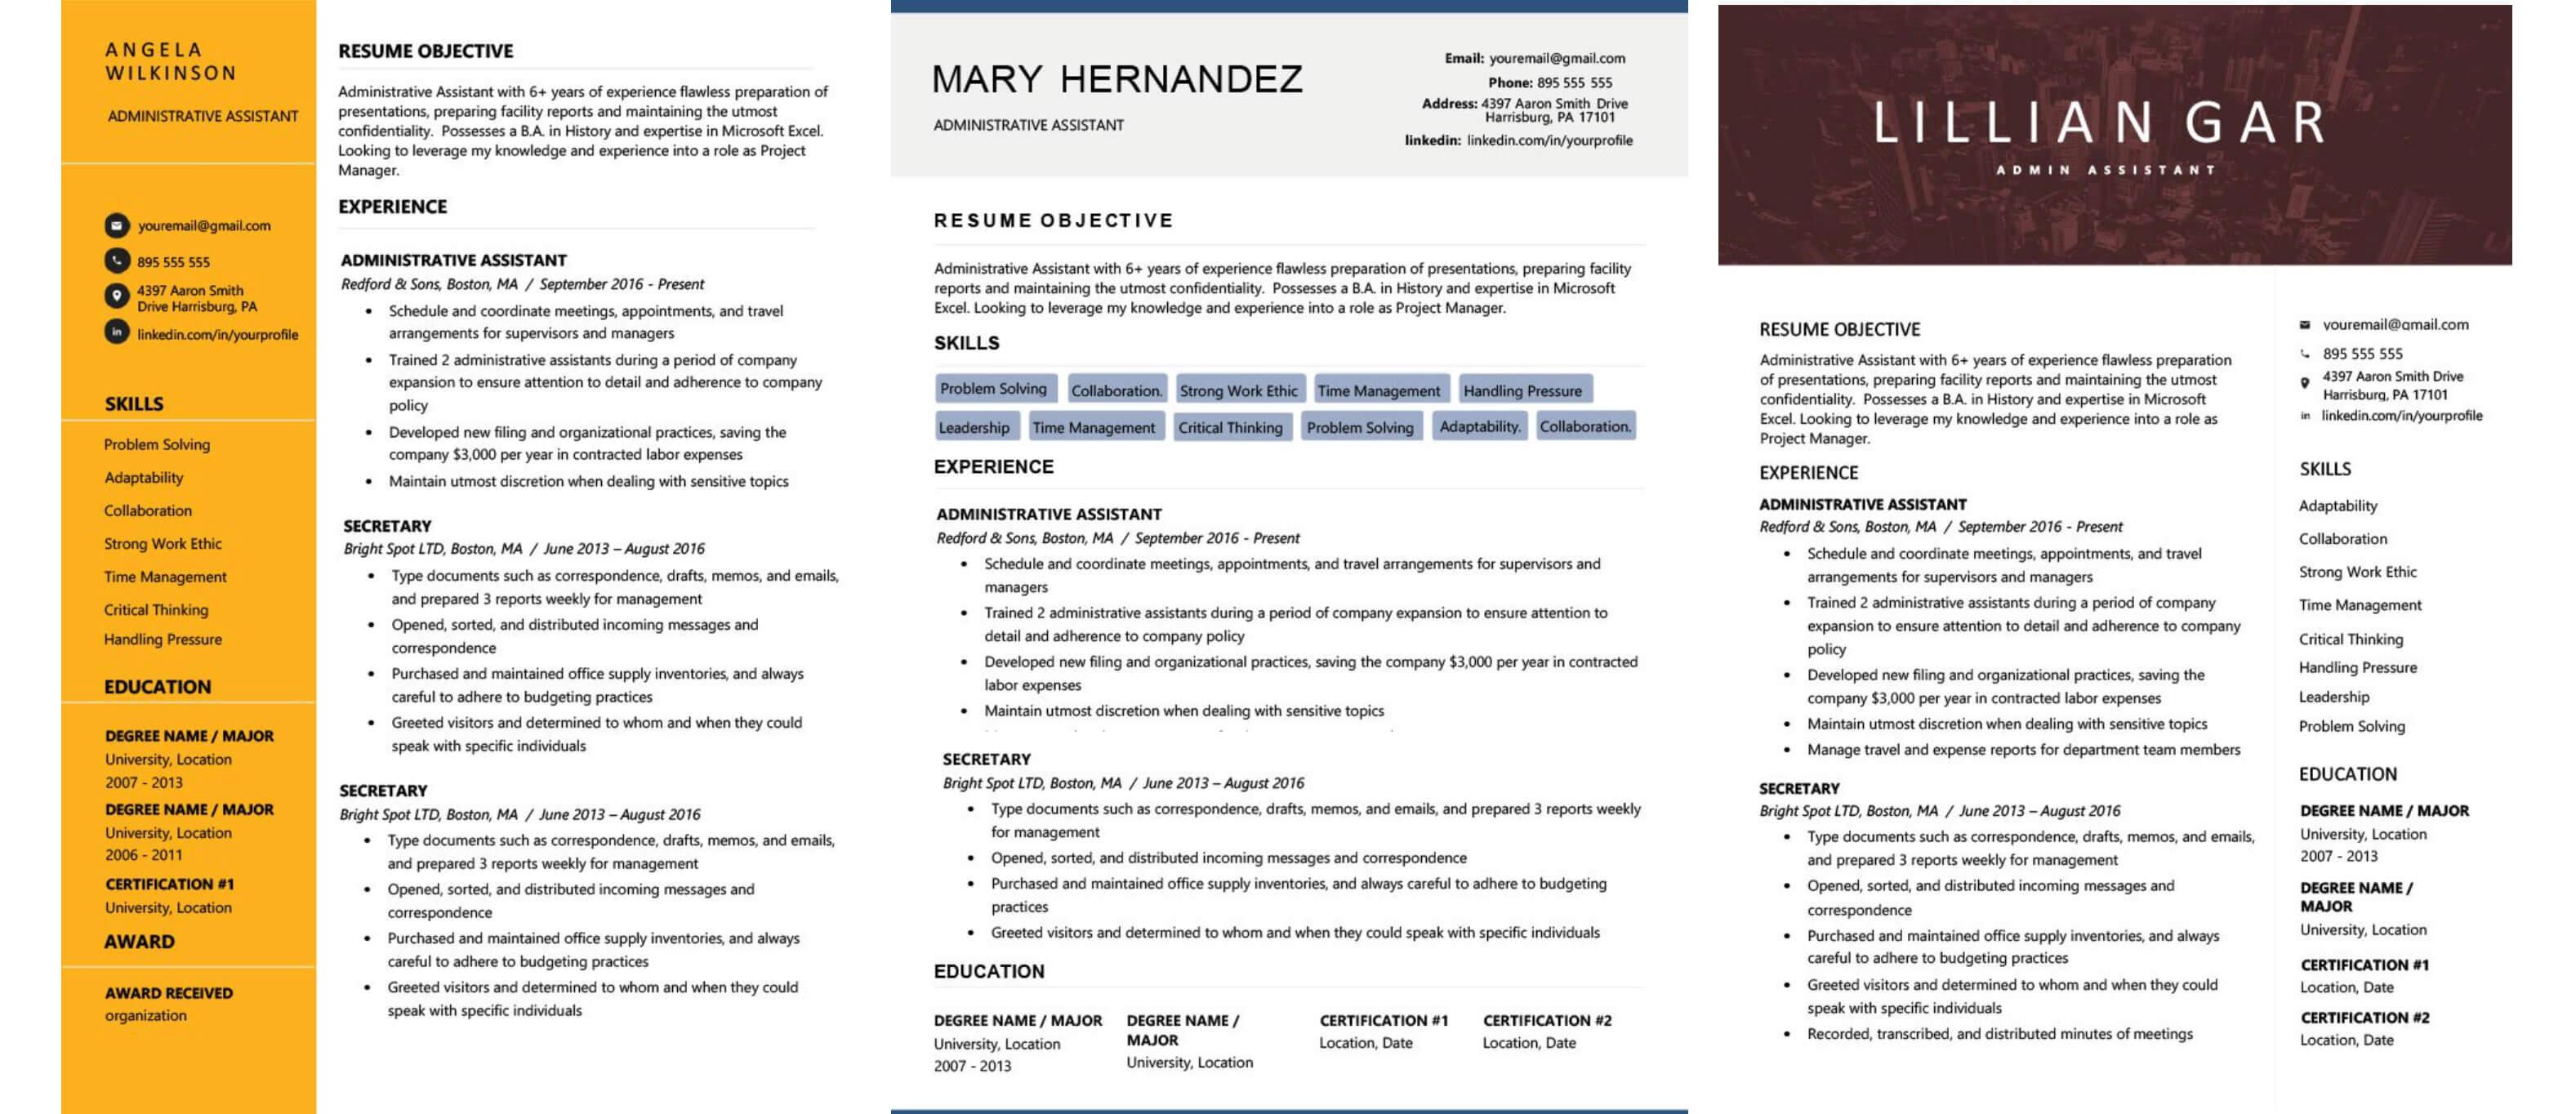 creative-resume-templates-1